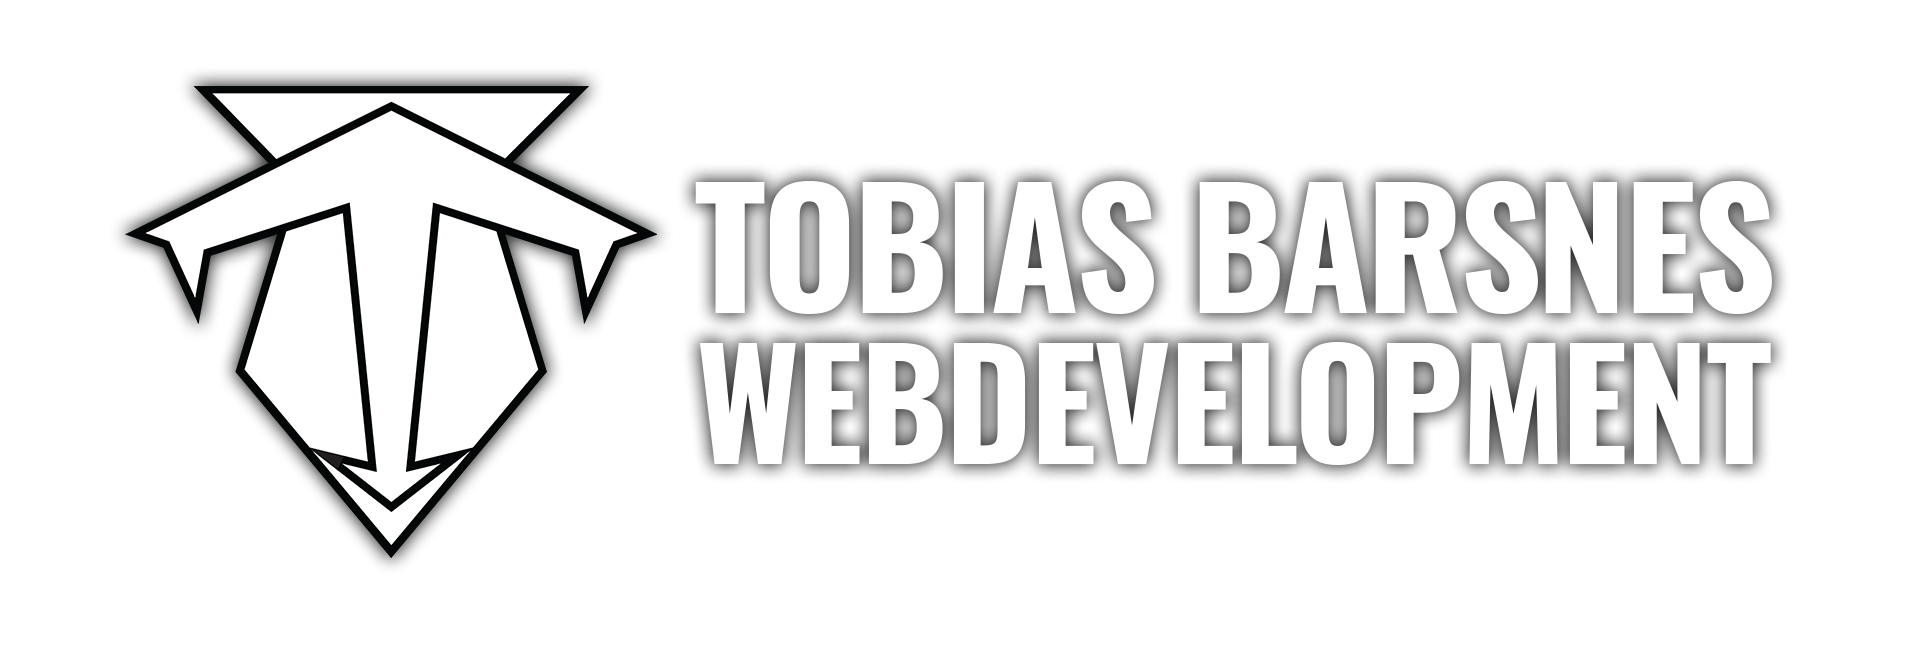 Tobias Barsnes Webdevelopment